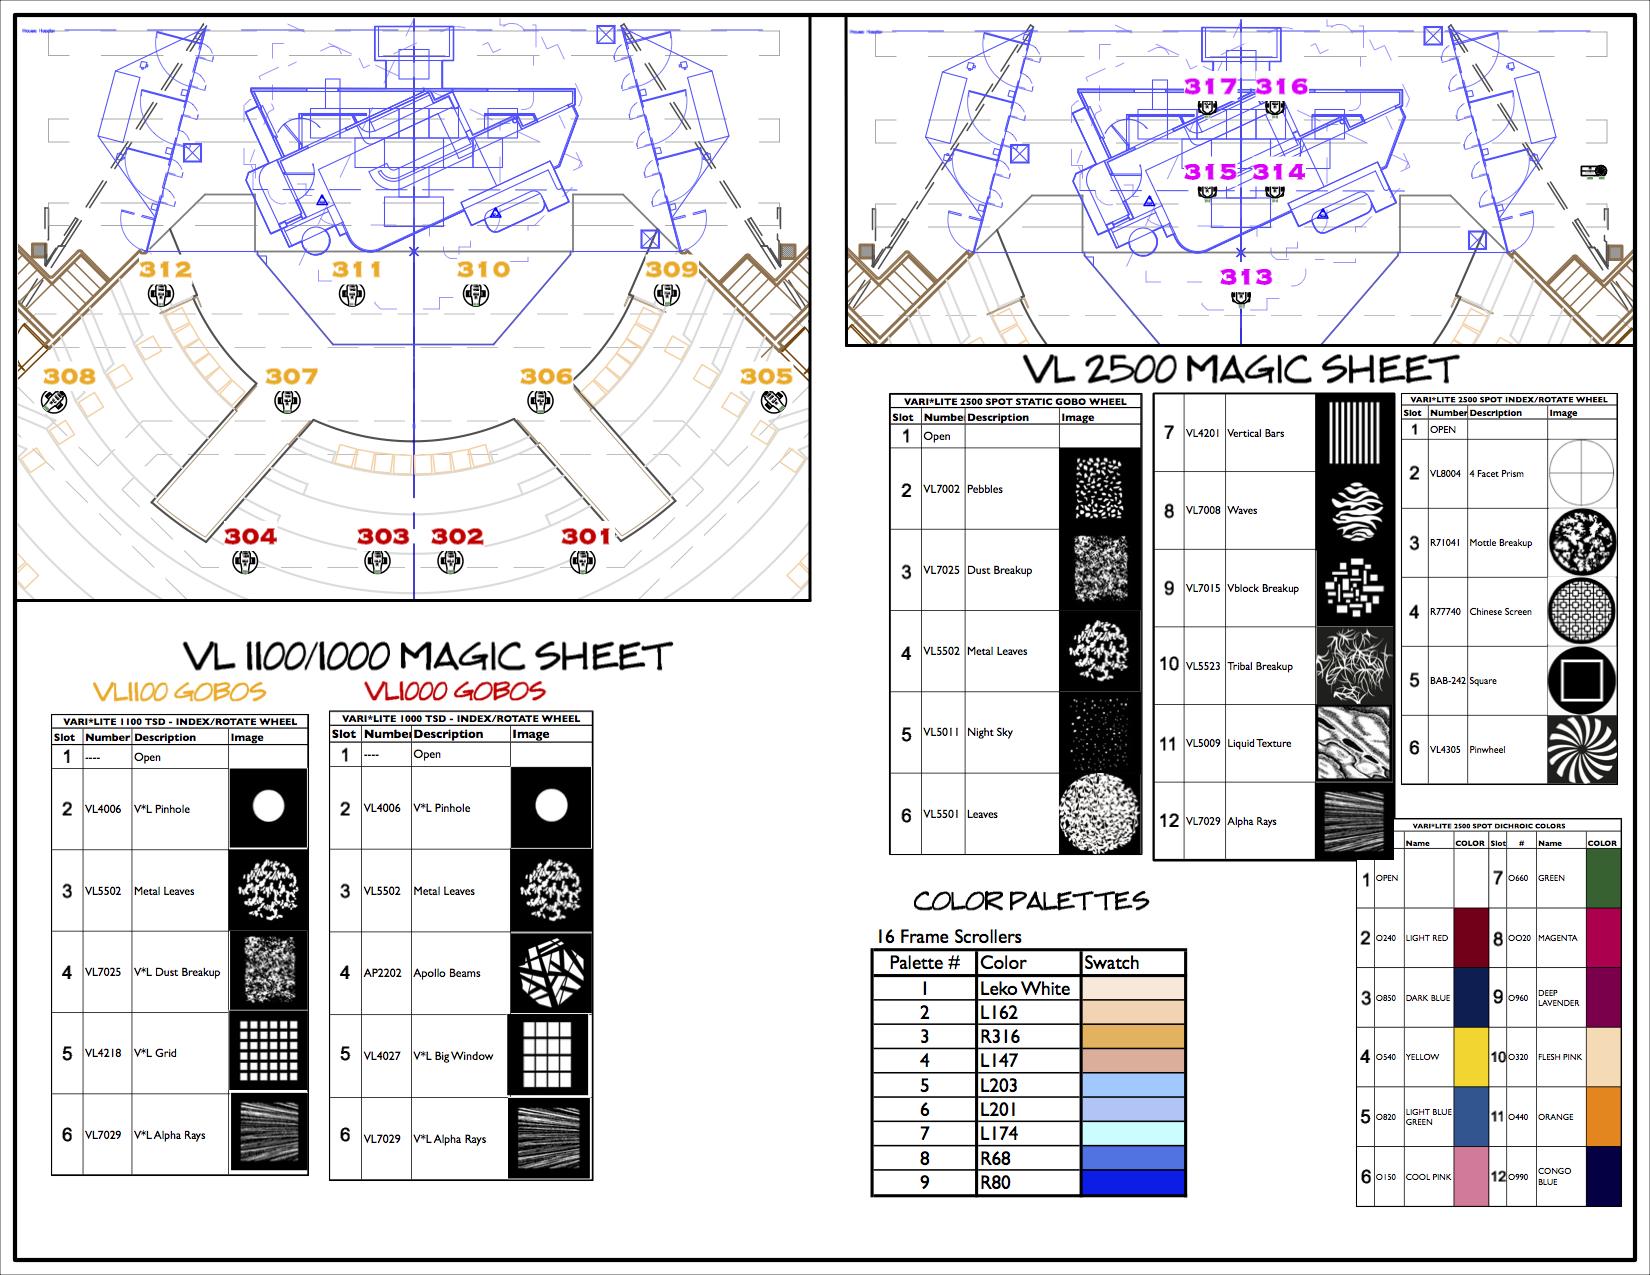 Moving Lx Magic Sheet - Sweat - OSF 2015 - LD: Peter Kaczorowski